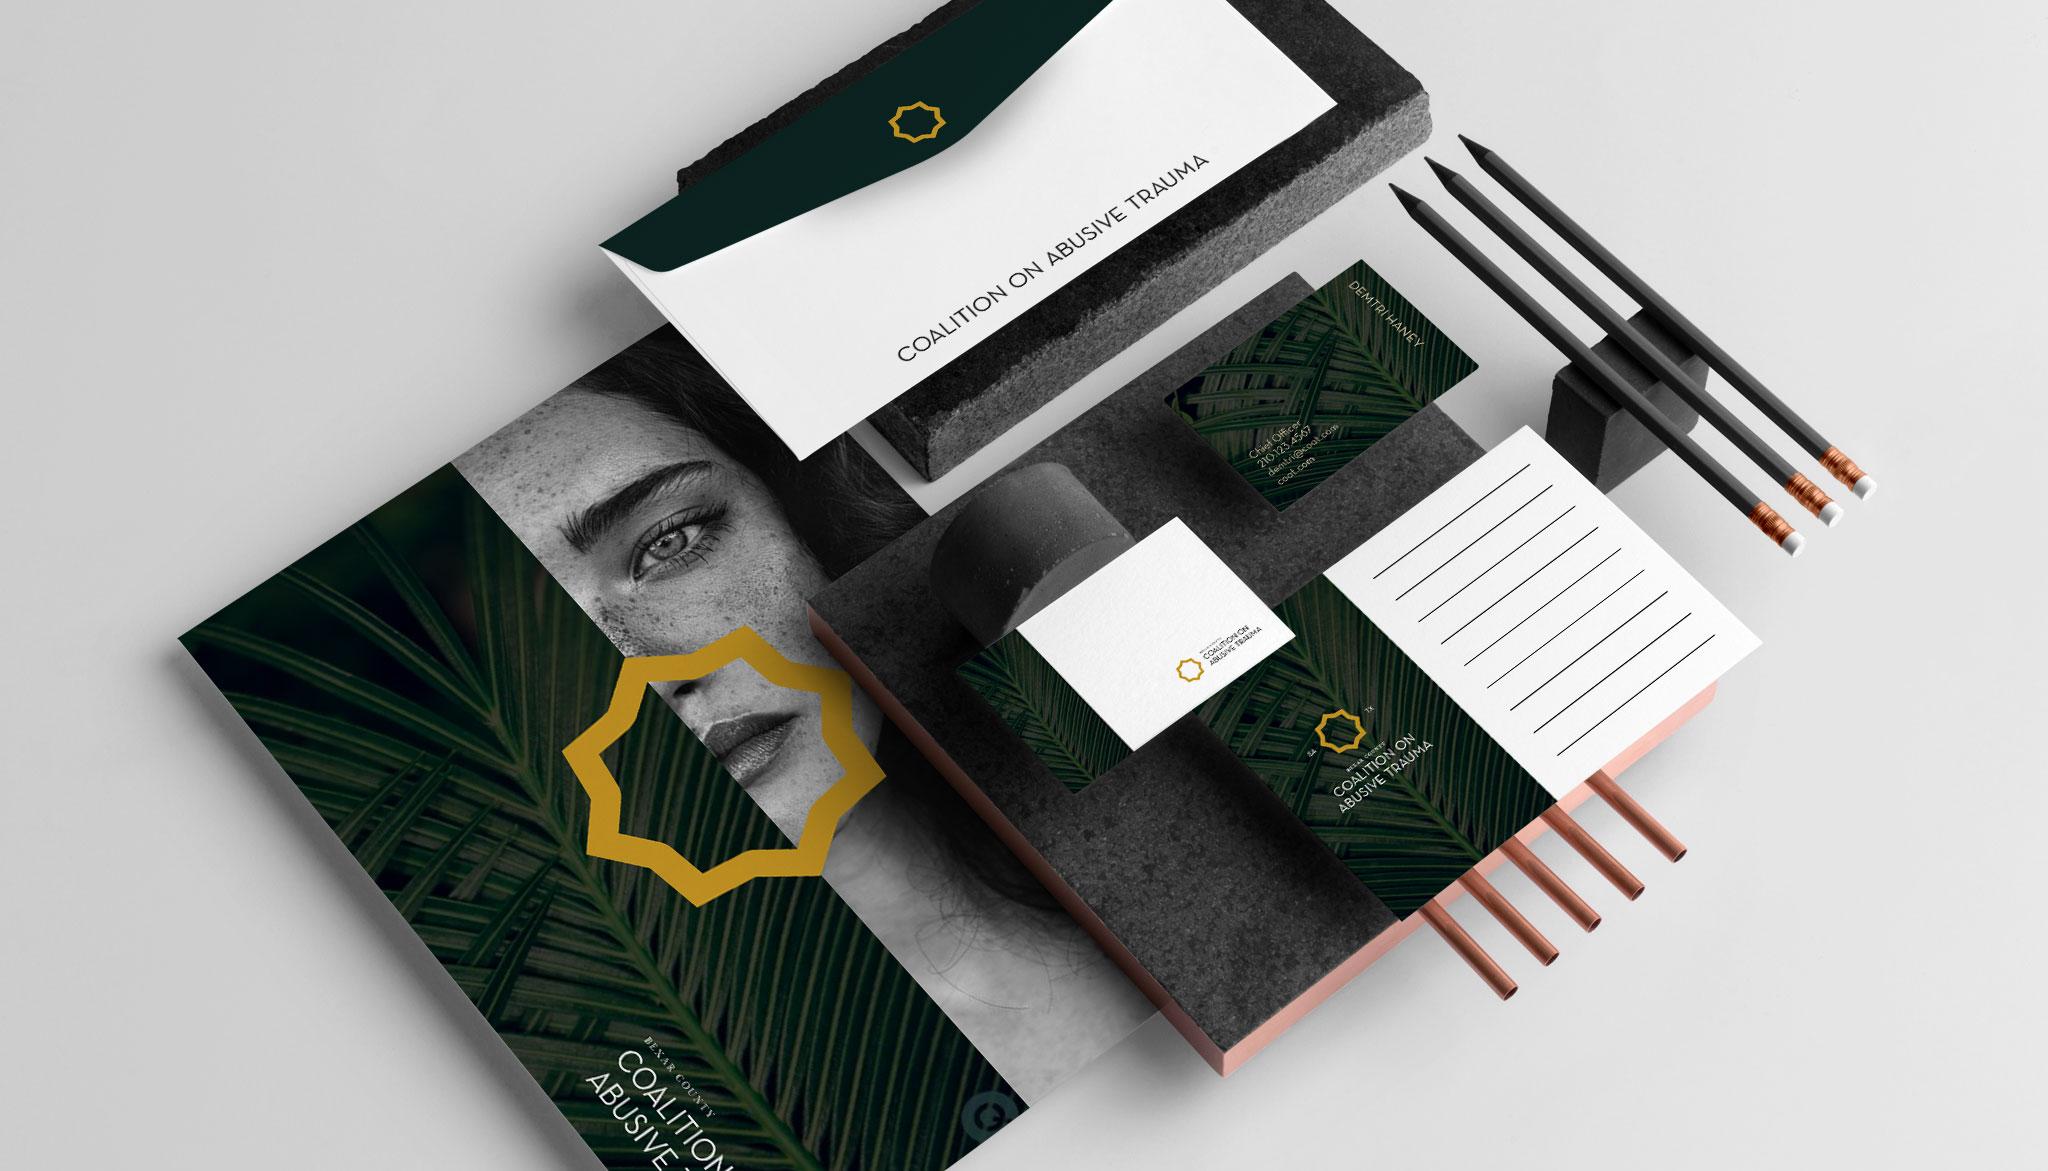 Coalition on Abusive Trauma brand design layout by GlassBeard Media in San Antonio, Texas